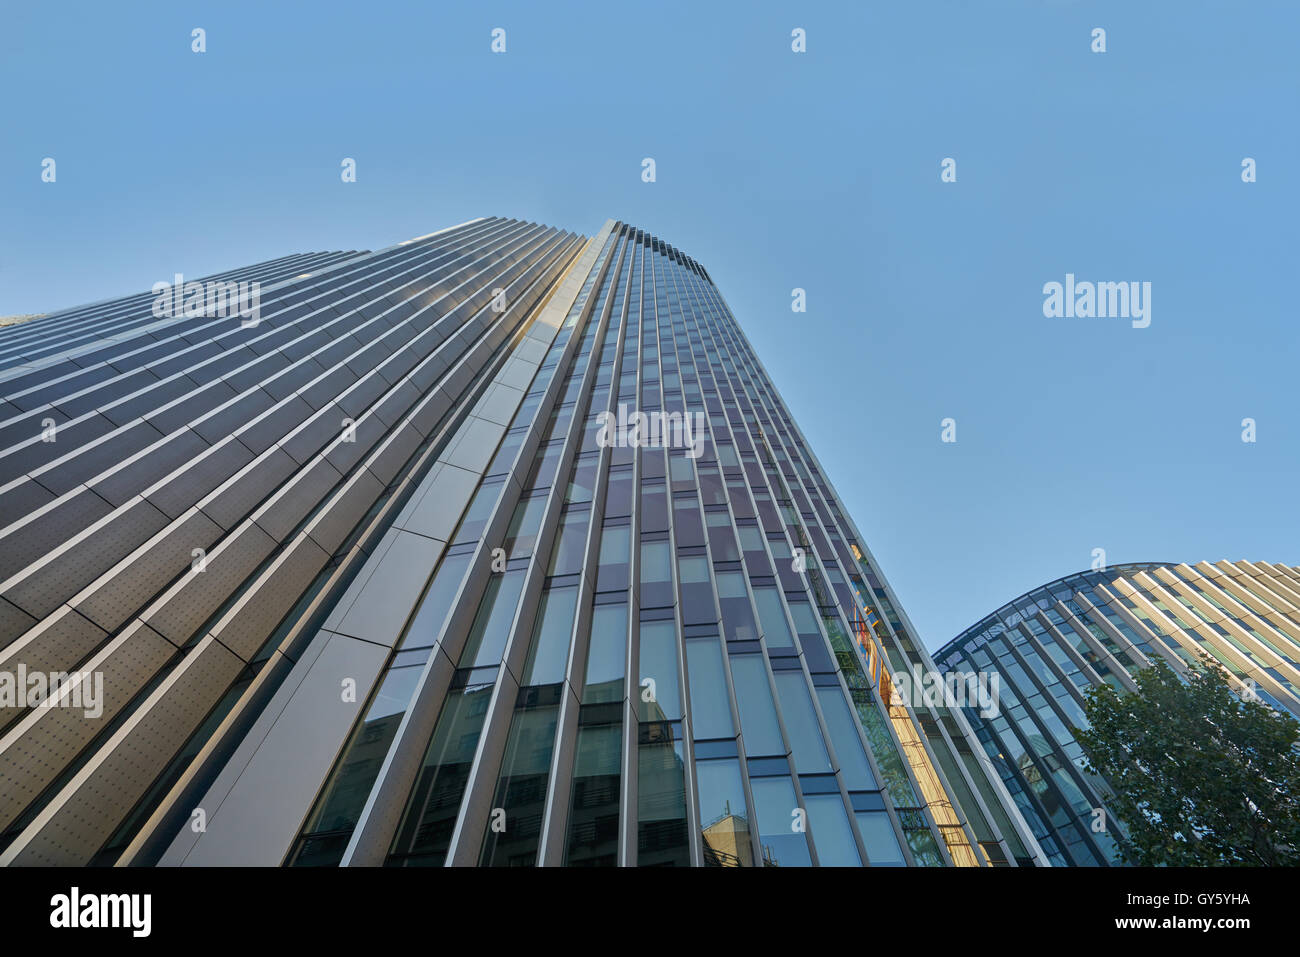 tall buildings, city of London. Glass buldings - Stock Image